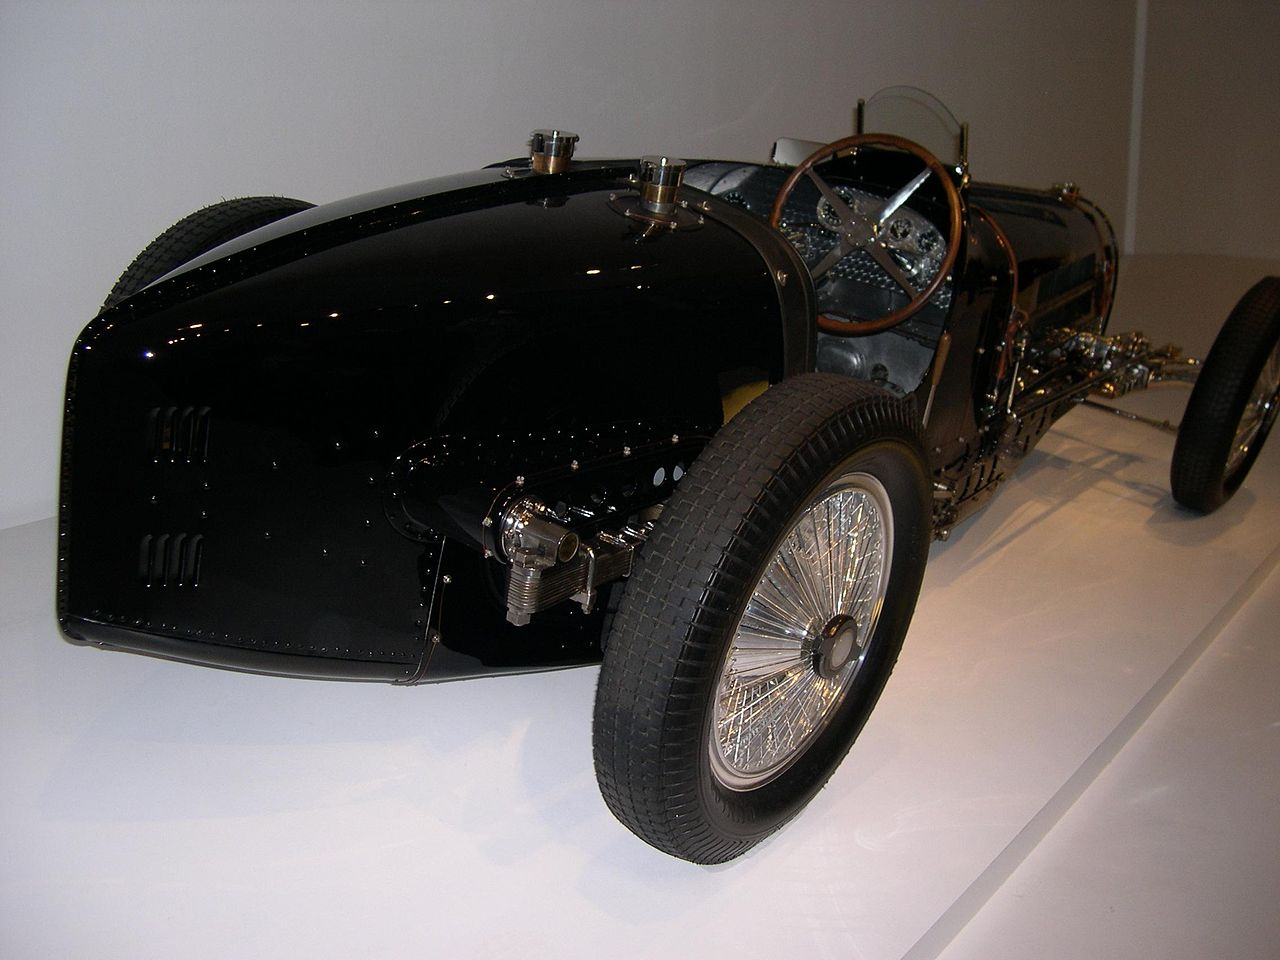 plik 1933 bugatti type 59 grand prix rear wikipedia wolna encyklopedia. Black Bedroom Furniture Sets. Home Design Ideas